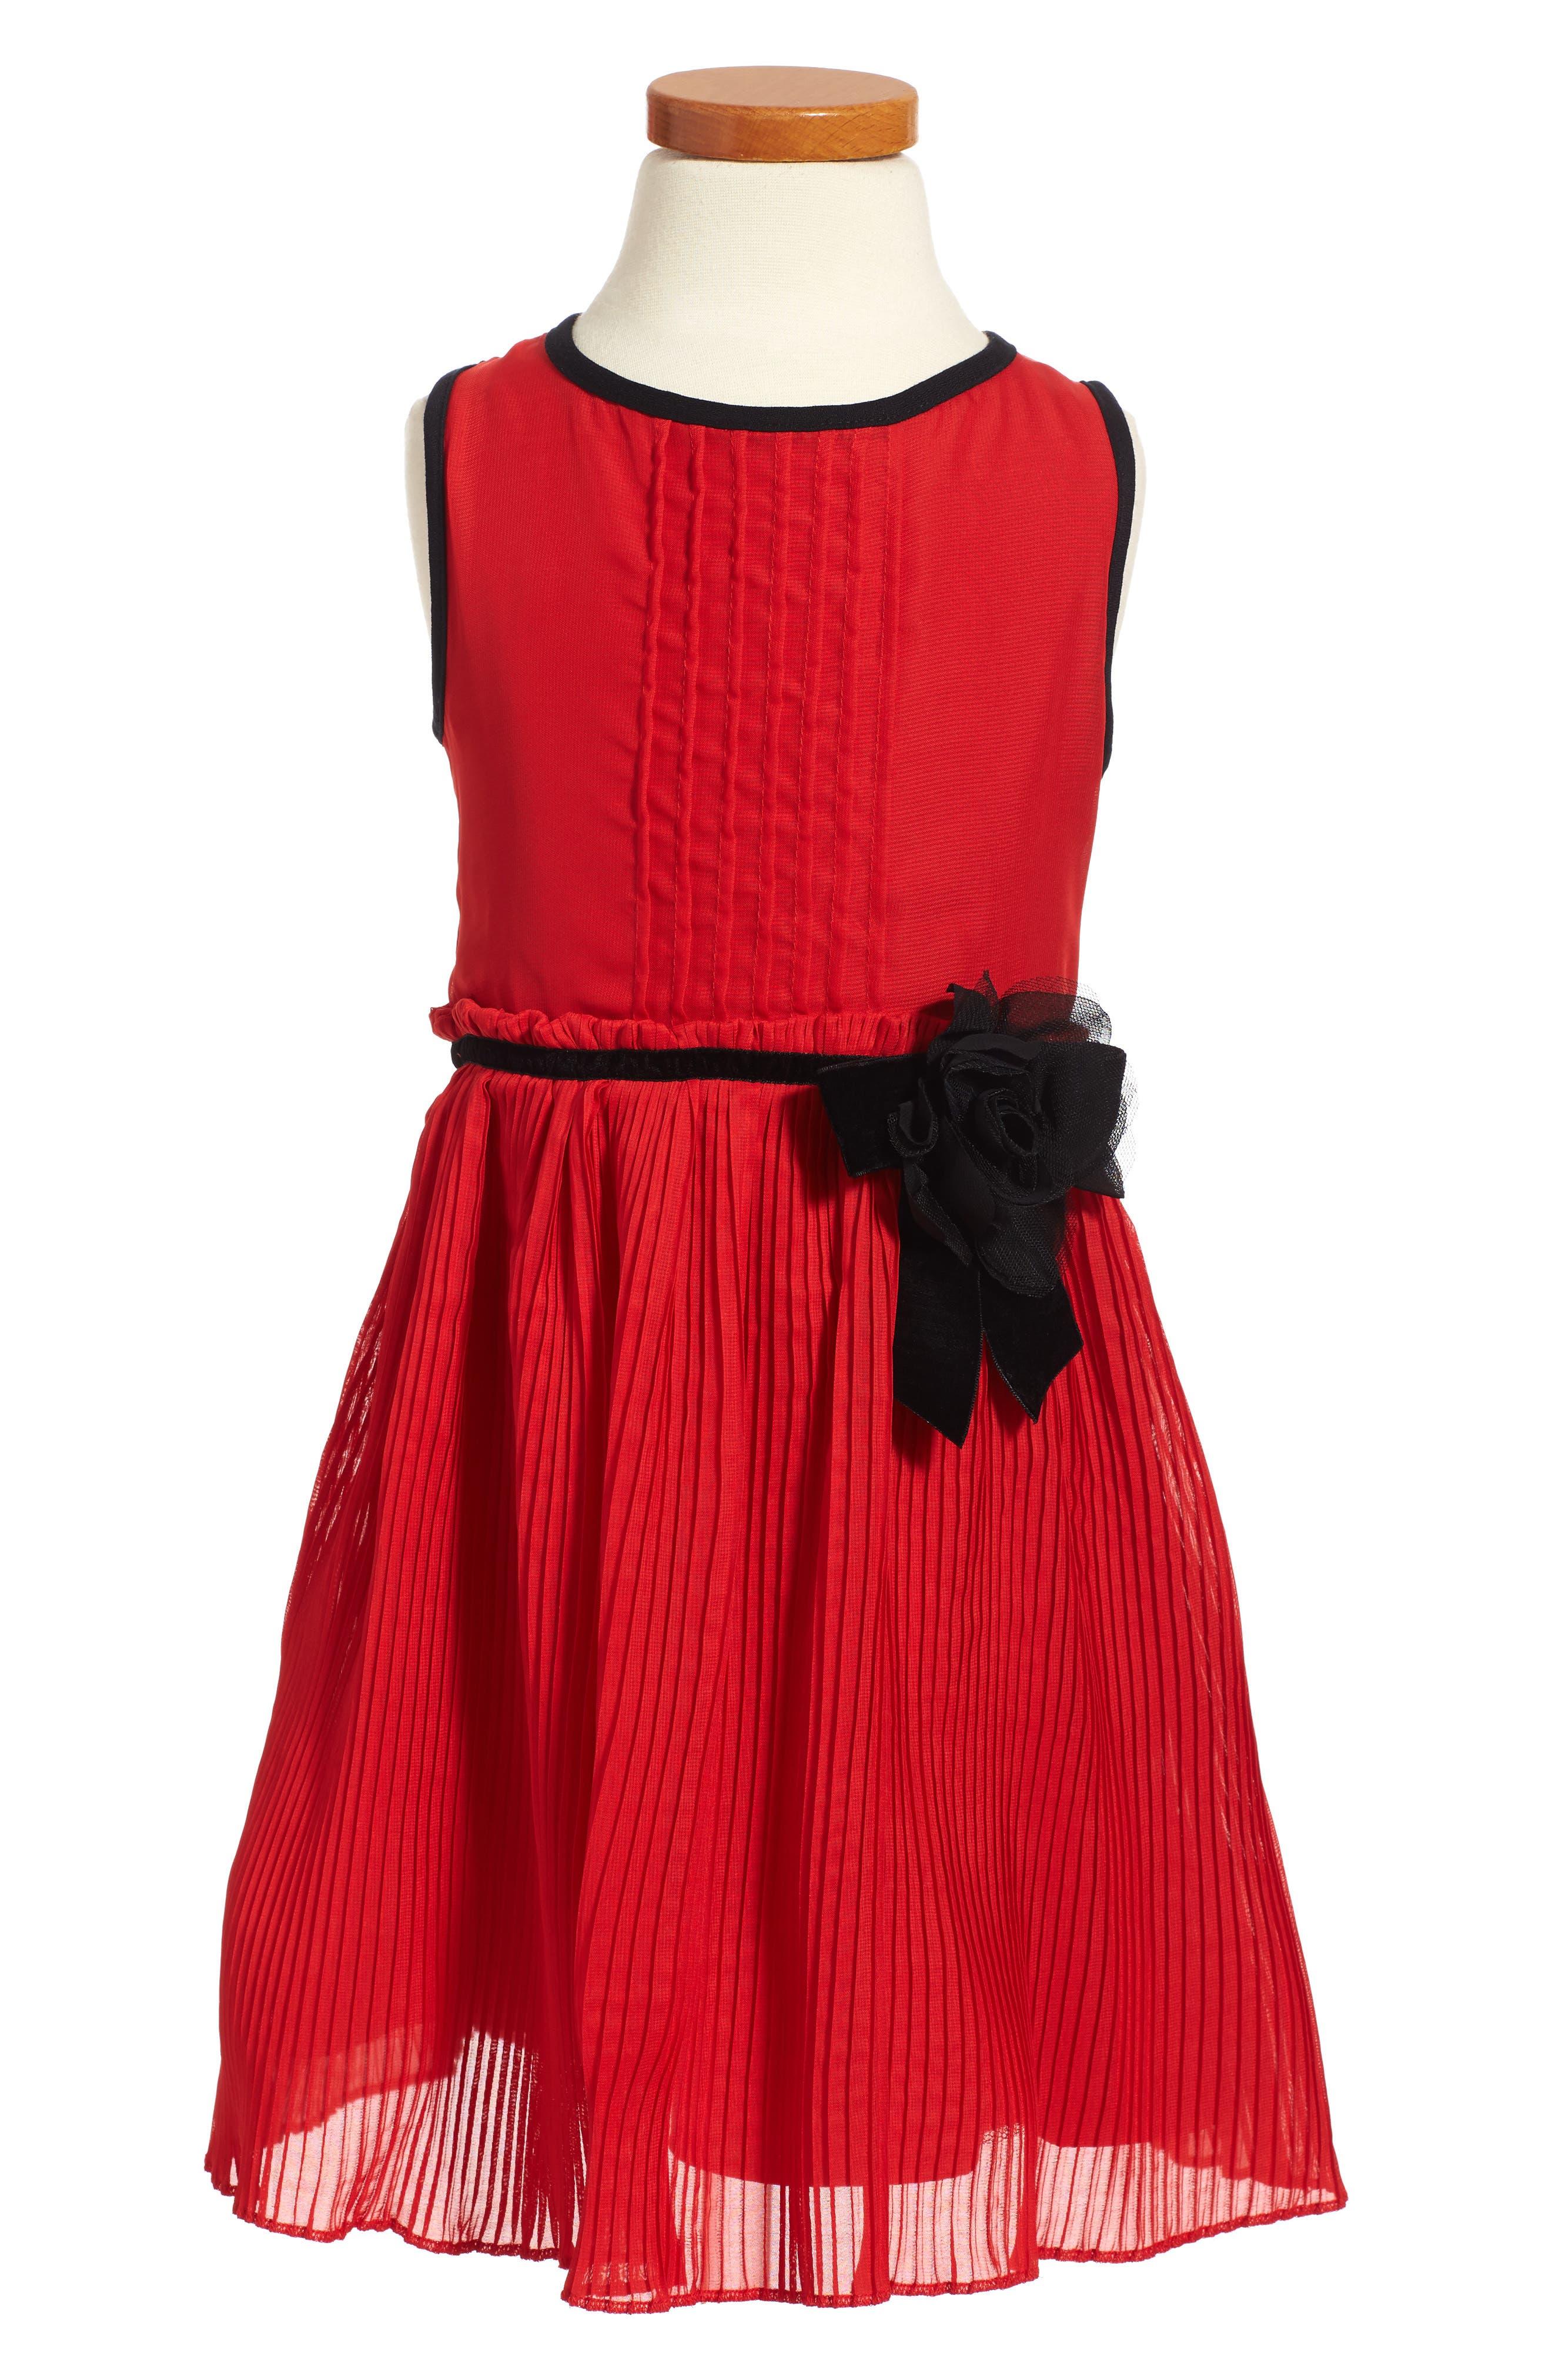 kate spade new york pleated chiffon dress (Toddler Girls & Little Girls)